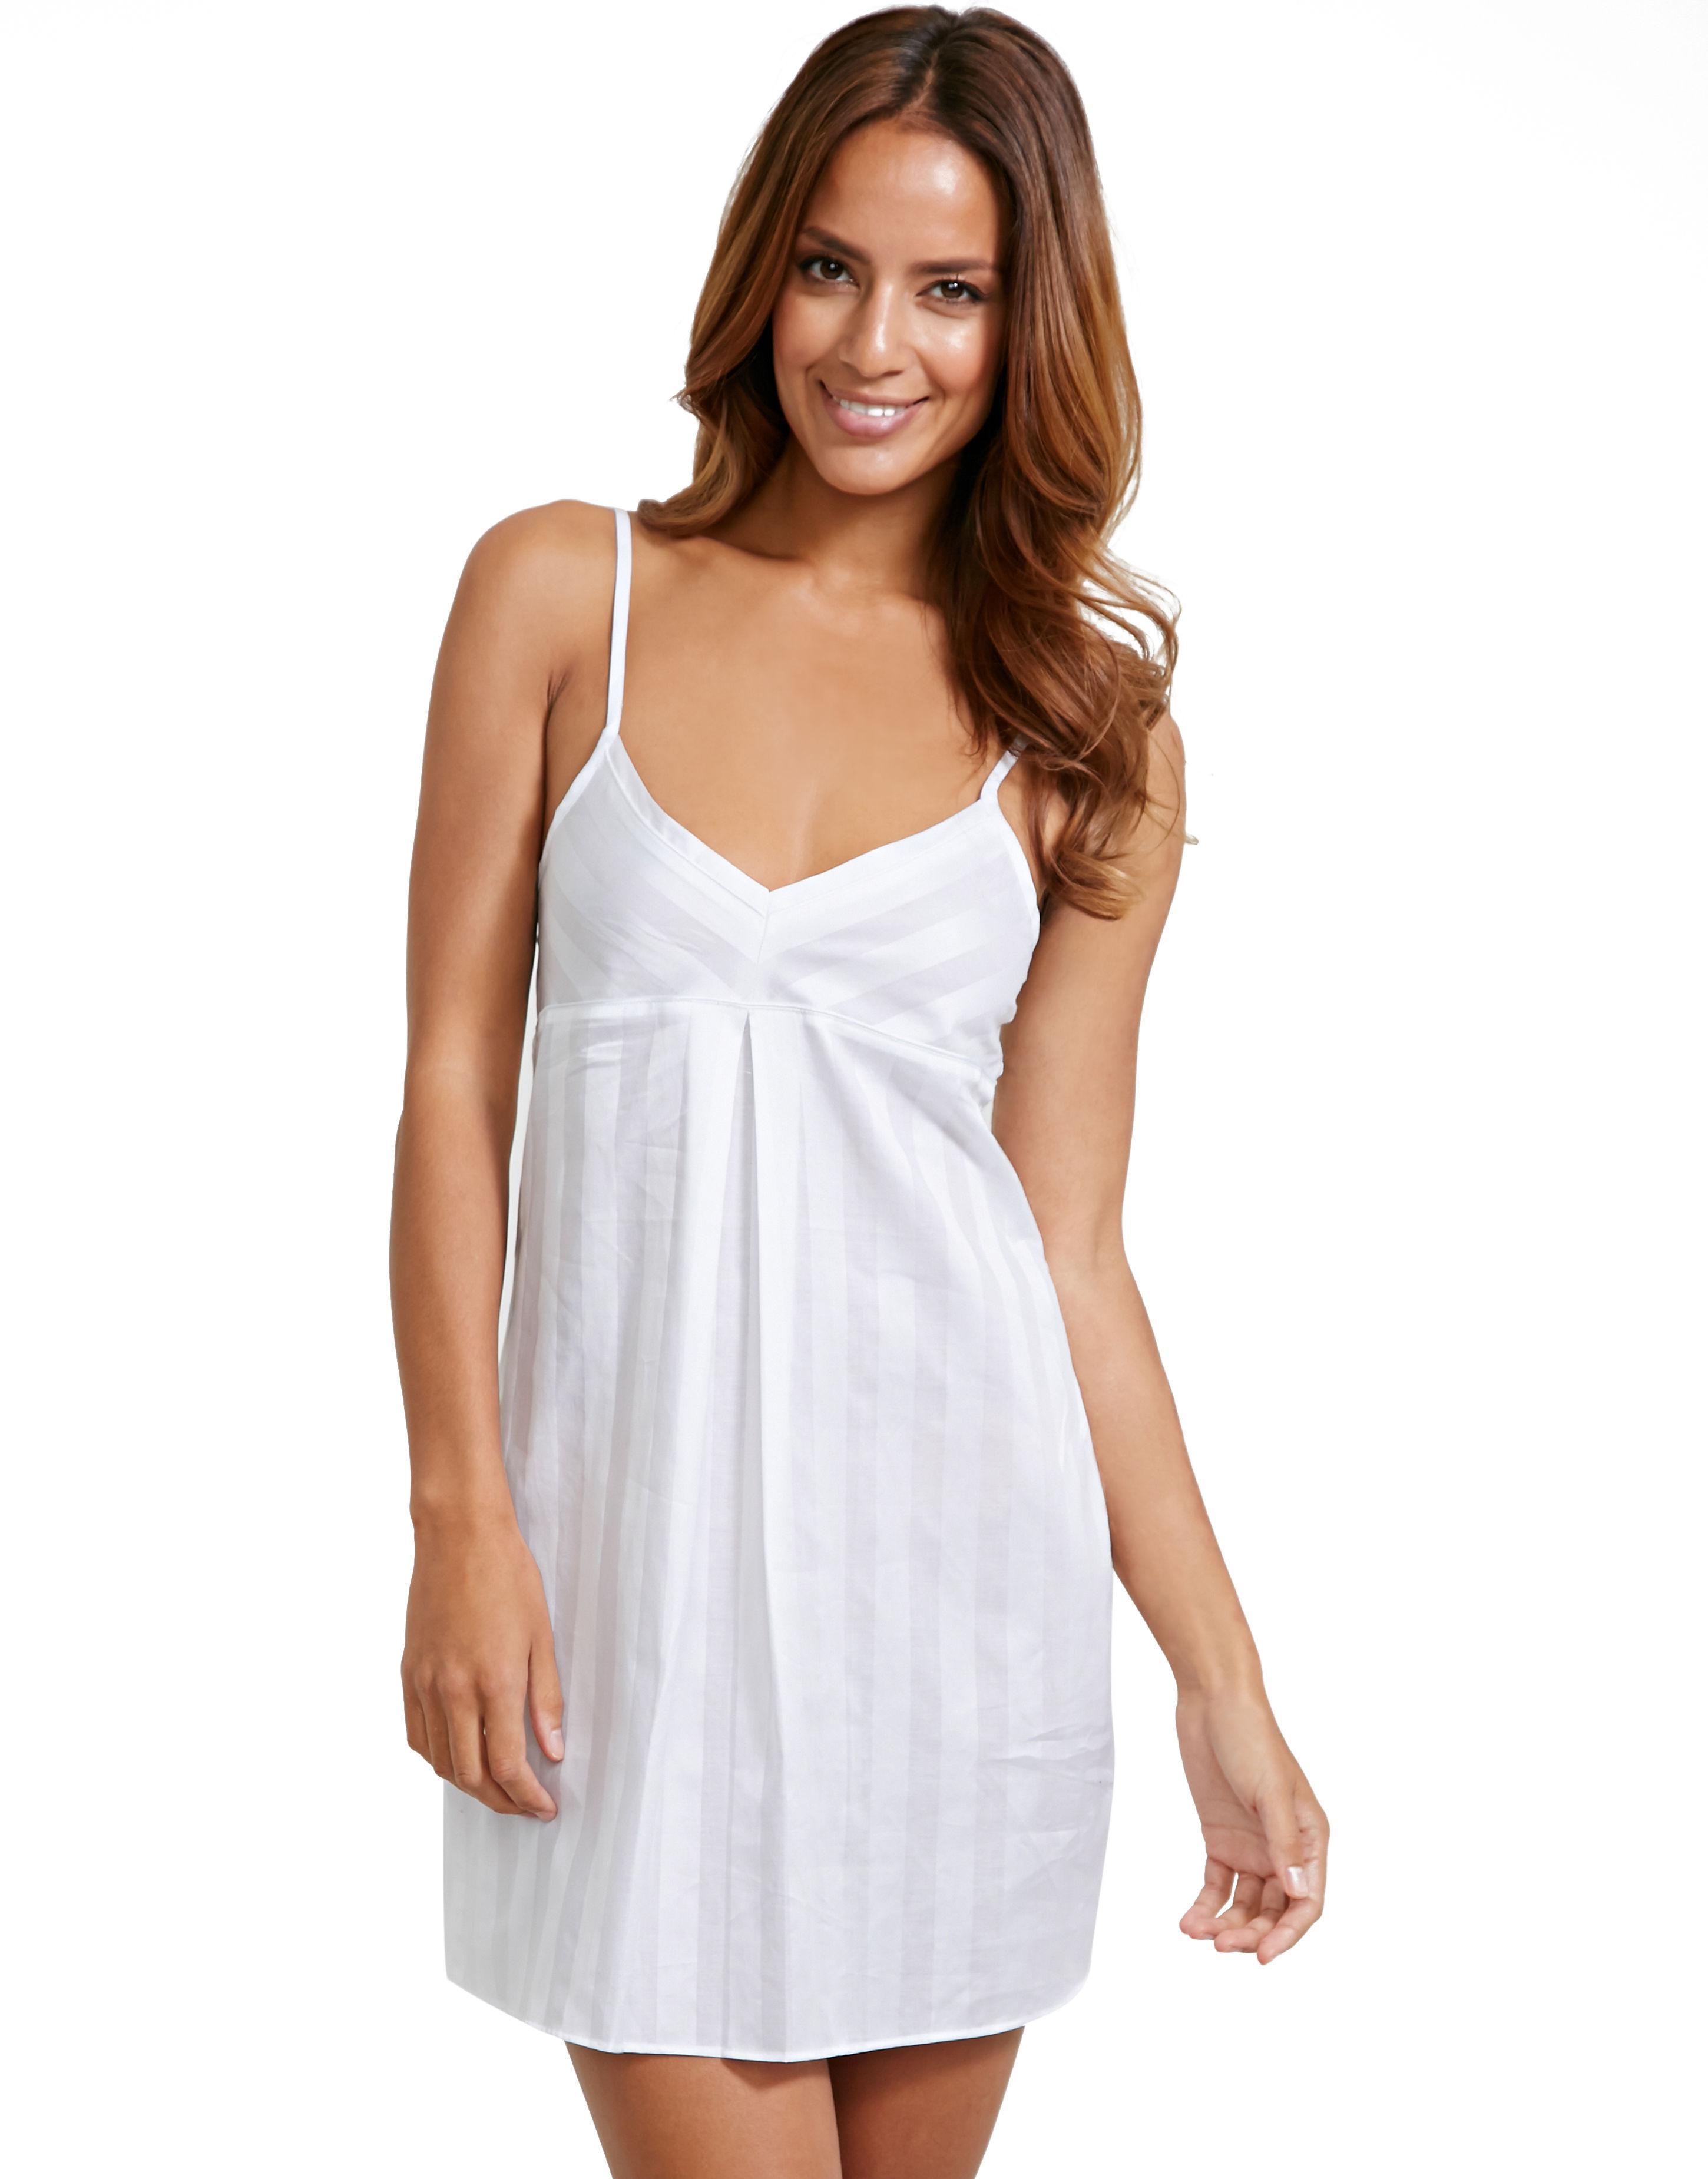 bf98b1f5d6 Bodas Cotton Nightwear Short Chemise in White - Lyst